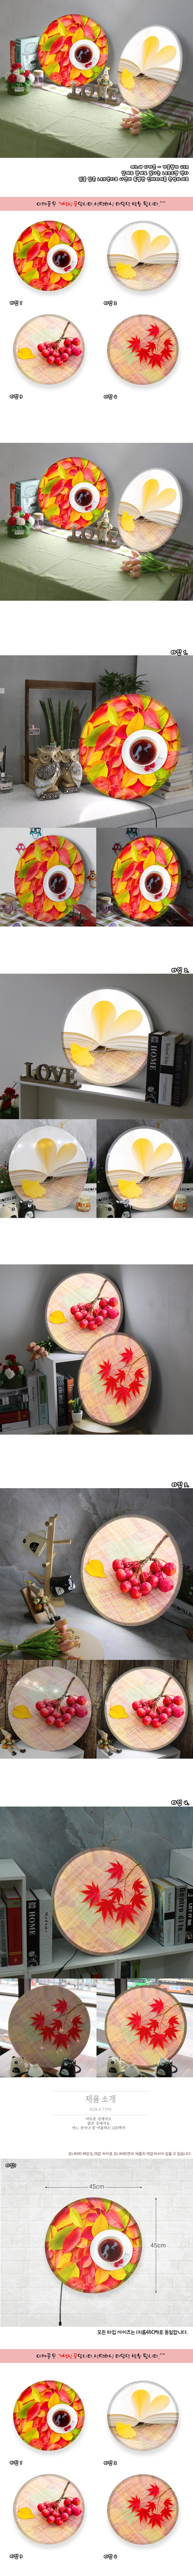 LED액자45R_가을향기 - 꾸밈, 86,000원, 포인트조명, 터치조명